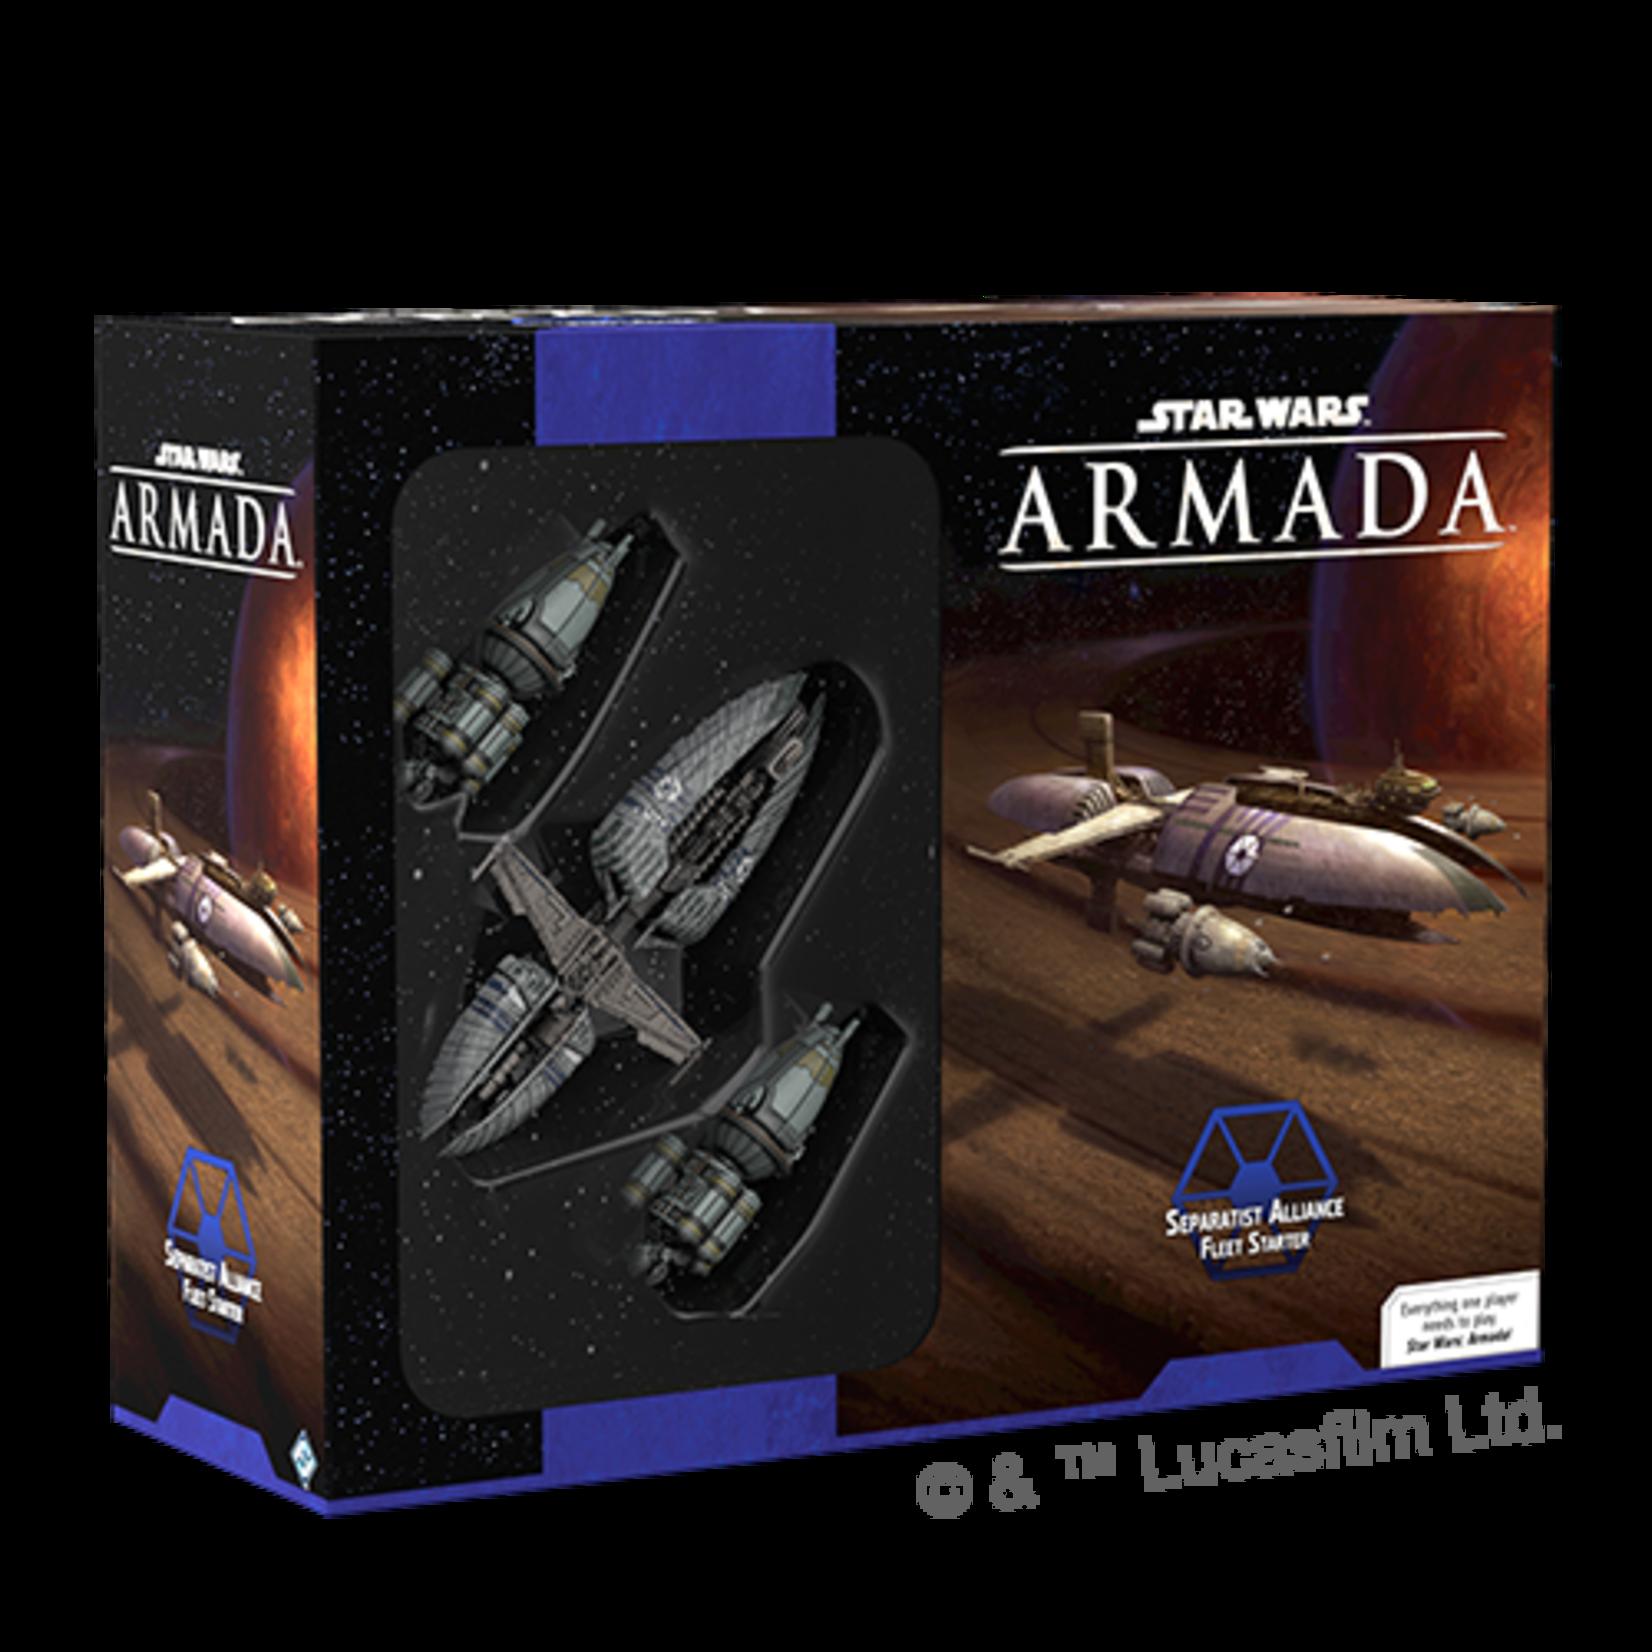 Fantasy Flight Games Star Wars Armada: Separatist Alliance Fleet Starter Set